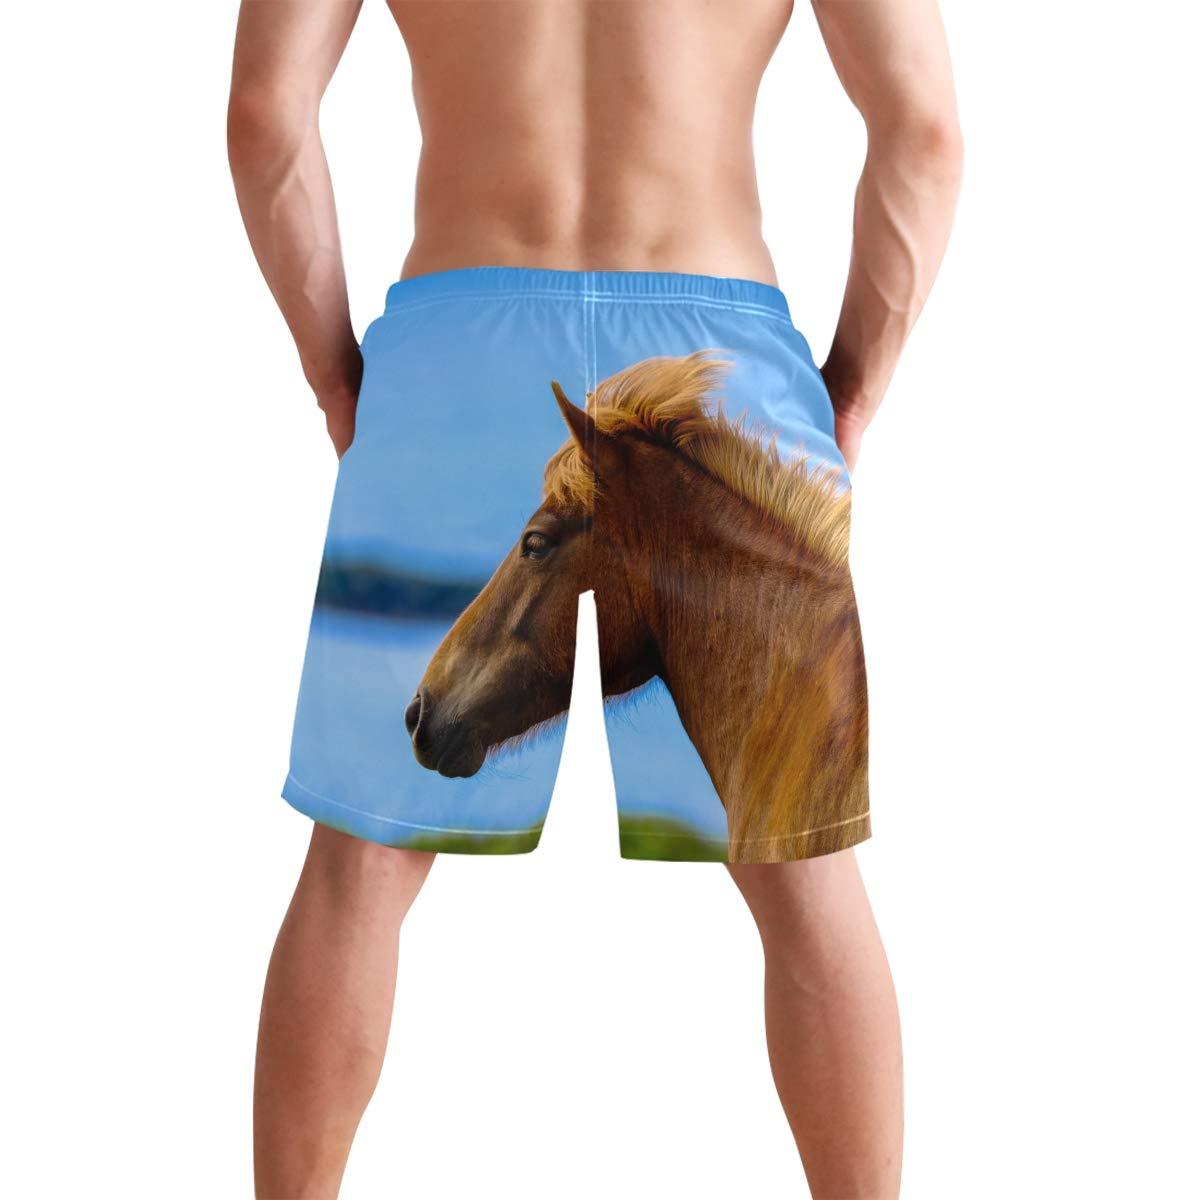 CiCily Men/'s Swim Trunks Brown Horse Beach Board Shorts Swimming Short Pants Running Sports Surffing Shorts